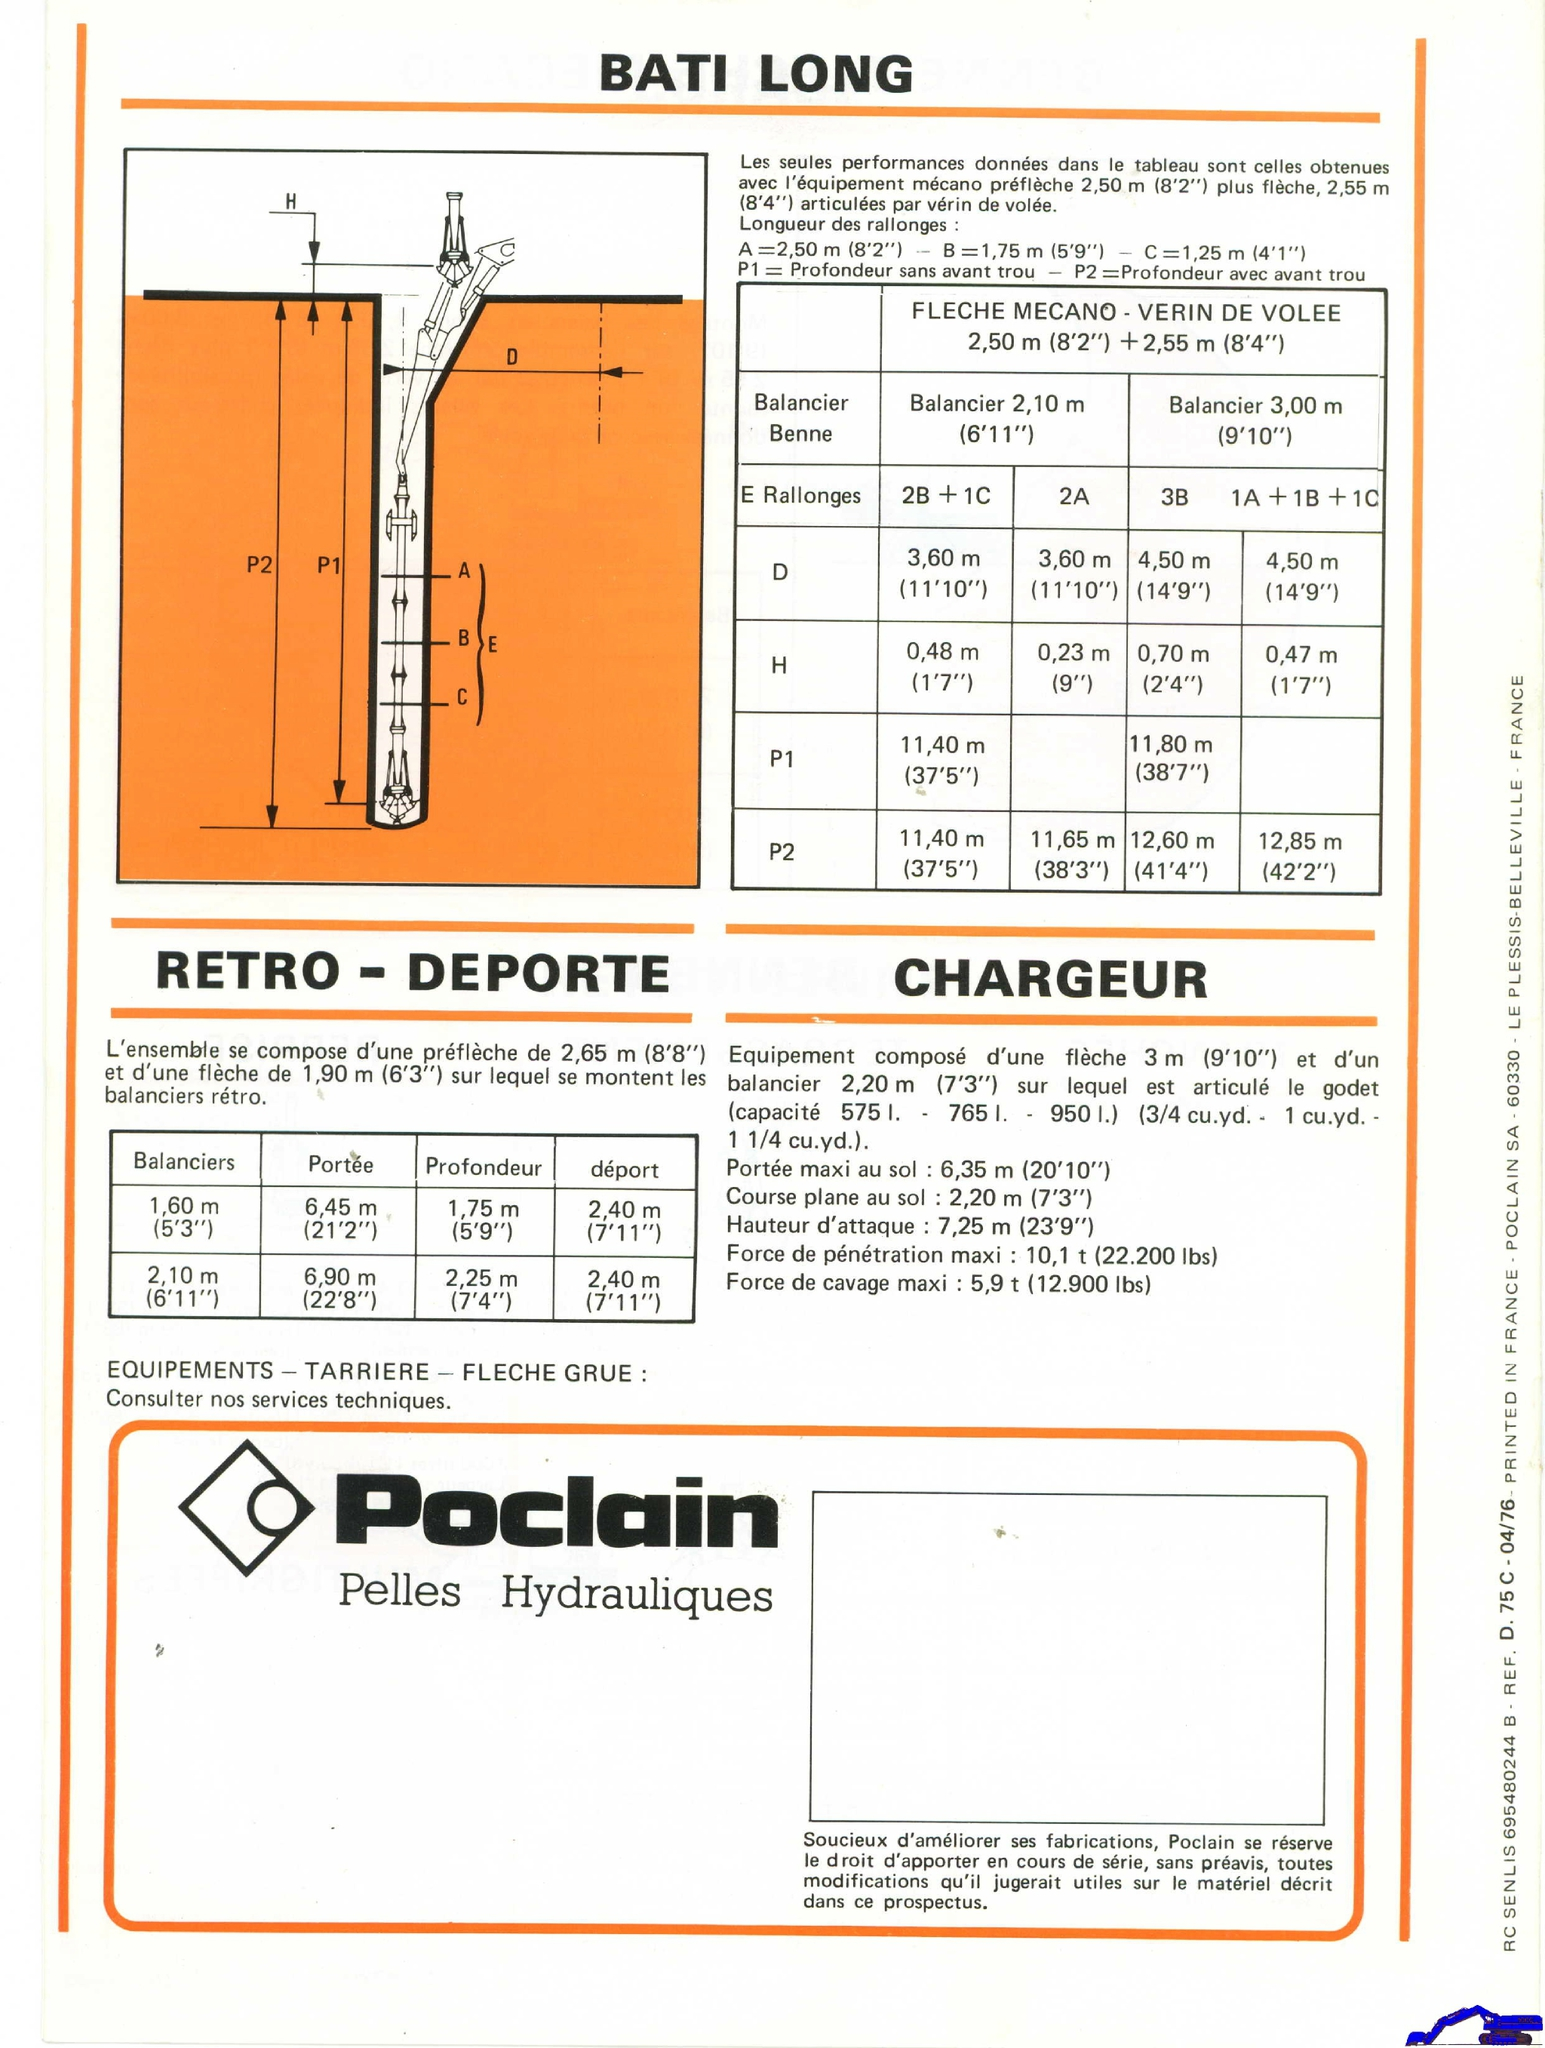 Technique Poclain 75 C